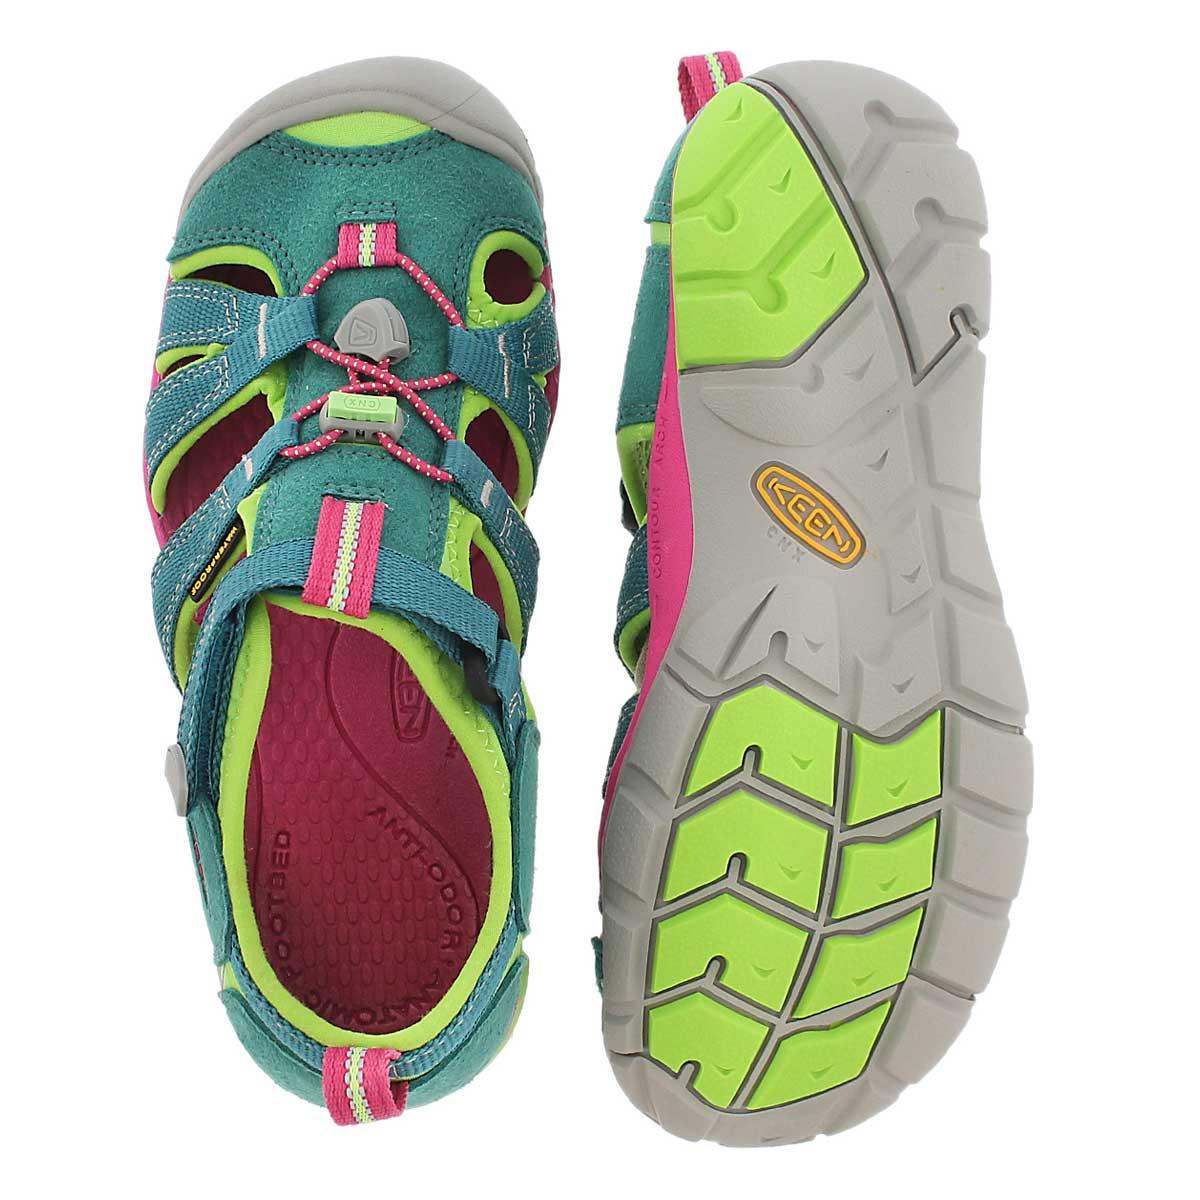 Grls Seacamp II everglade sandal